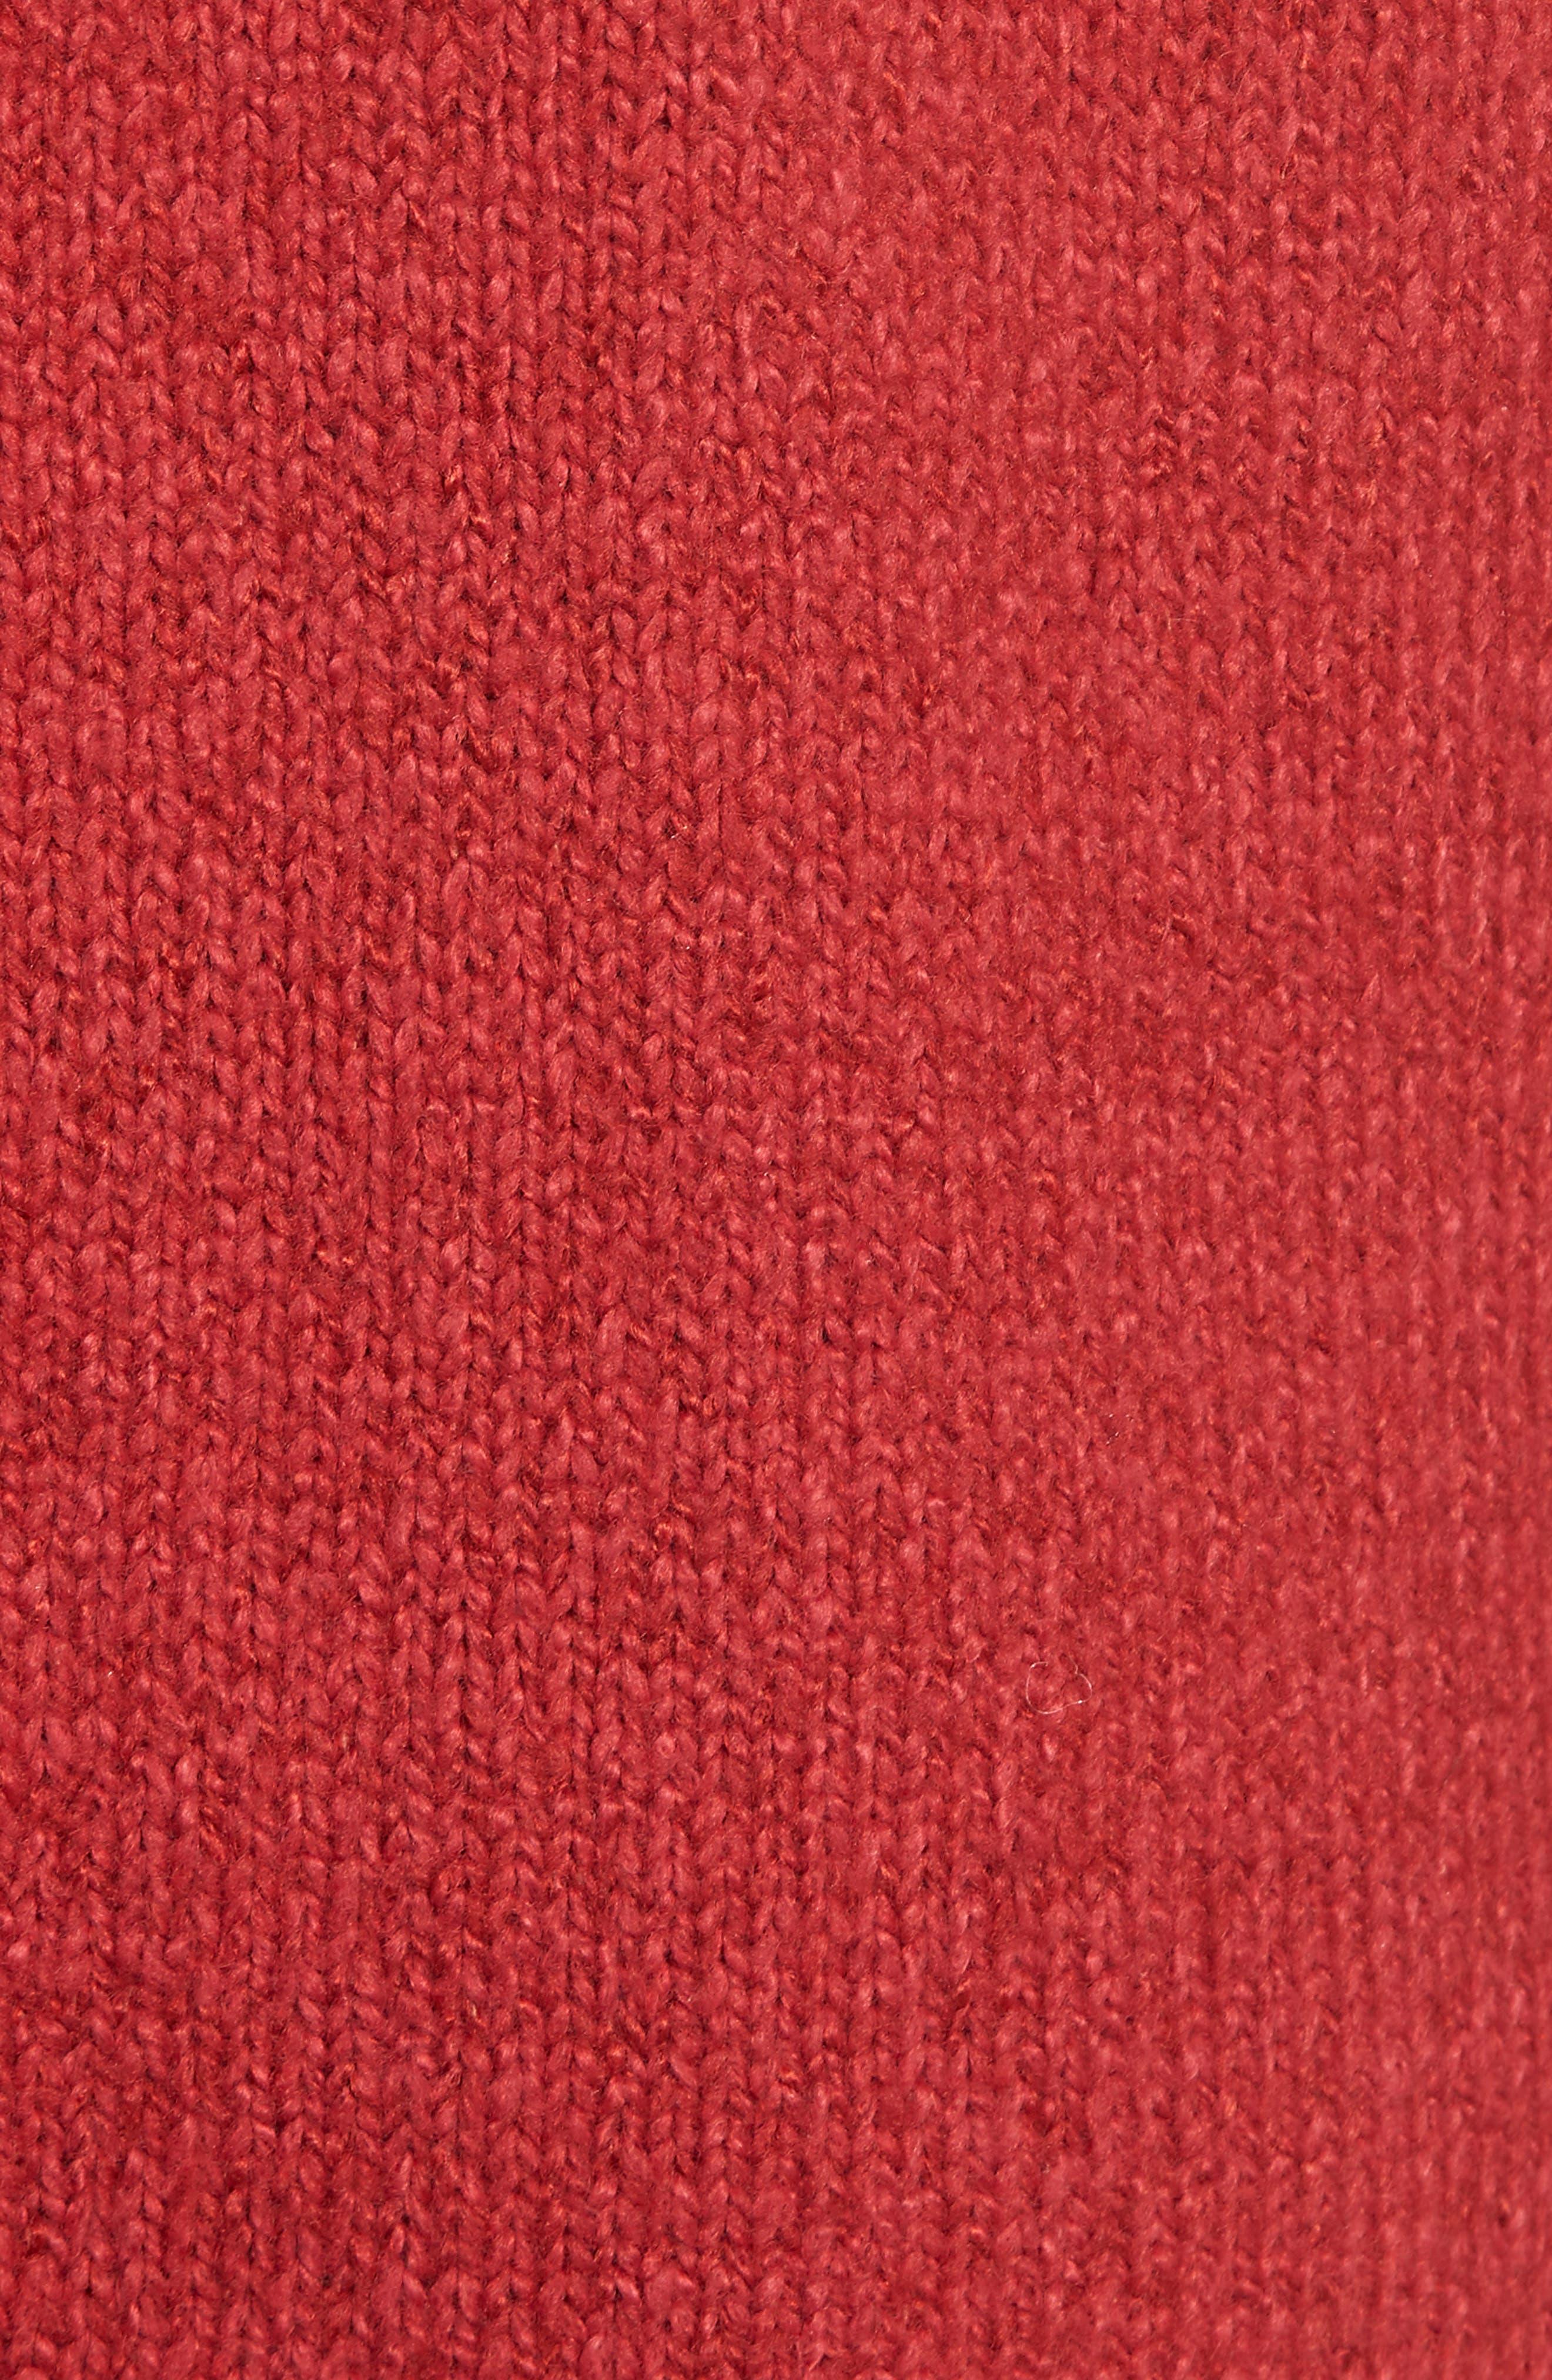 Cotton Blend Cardigan,                             Alternate thumbnail 5, color,                             RED